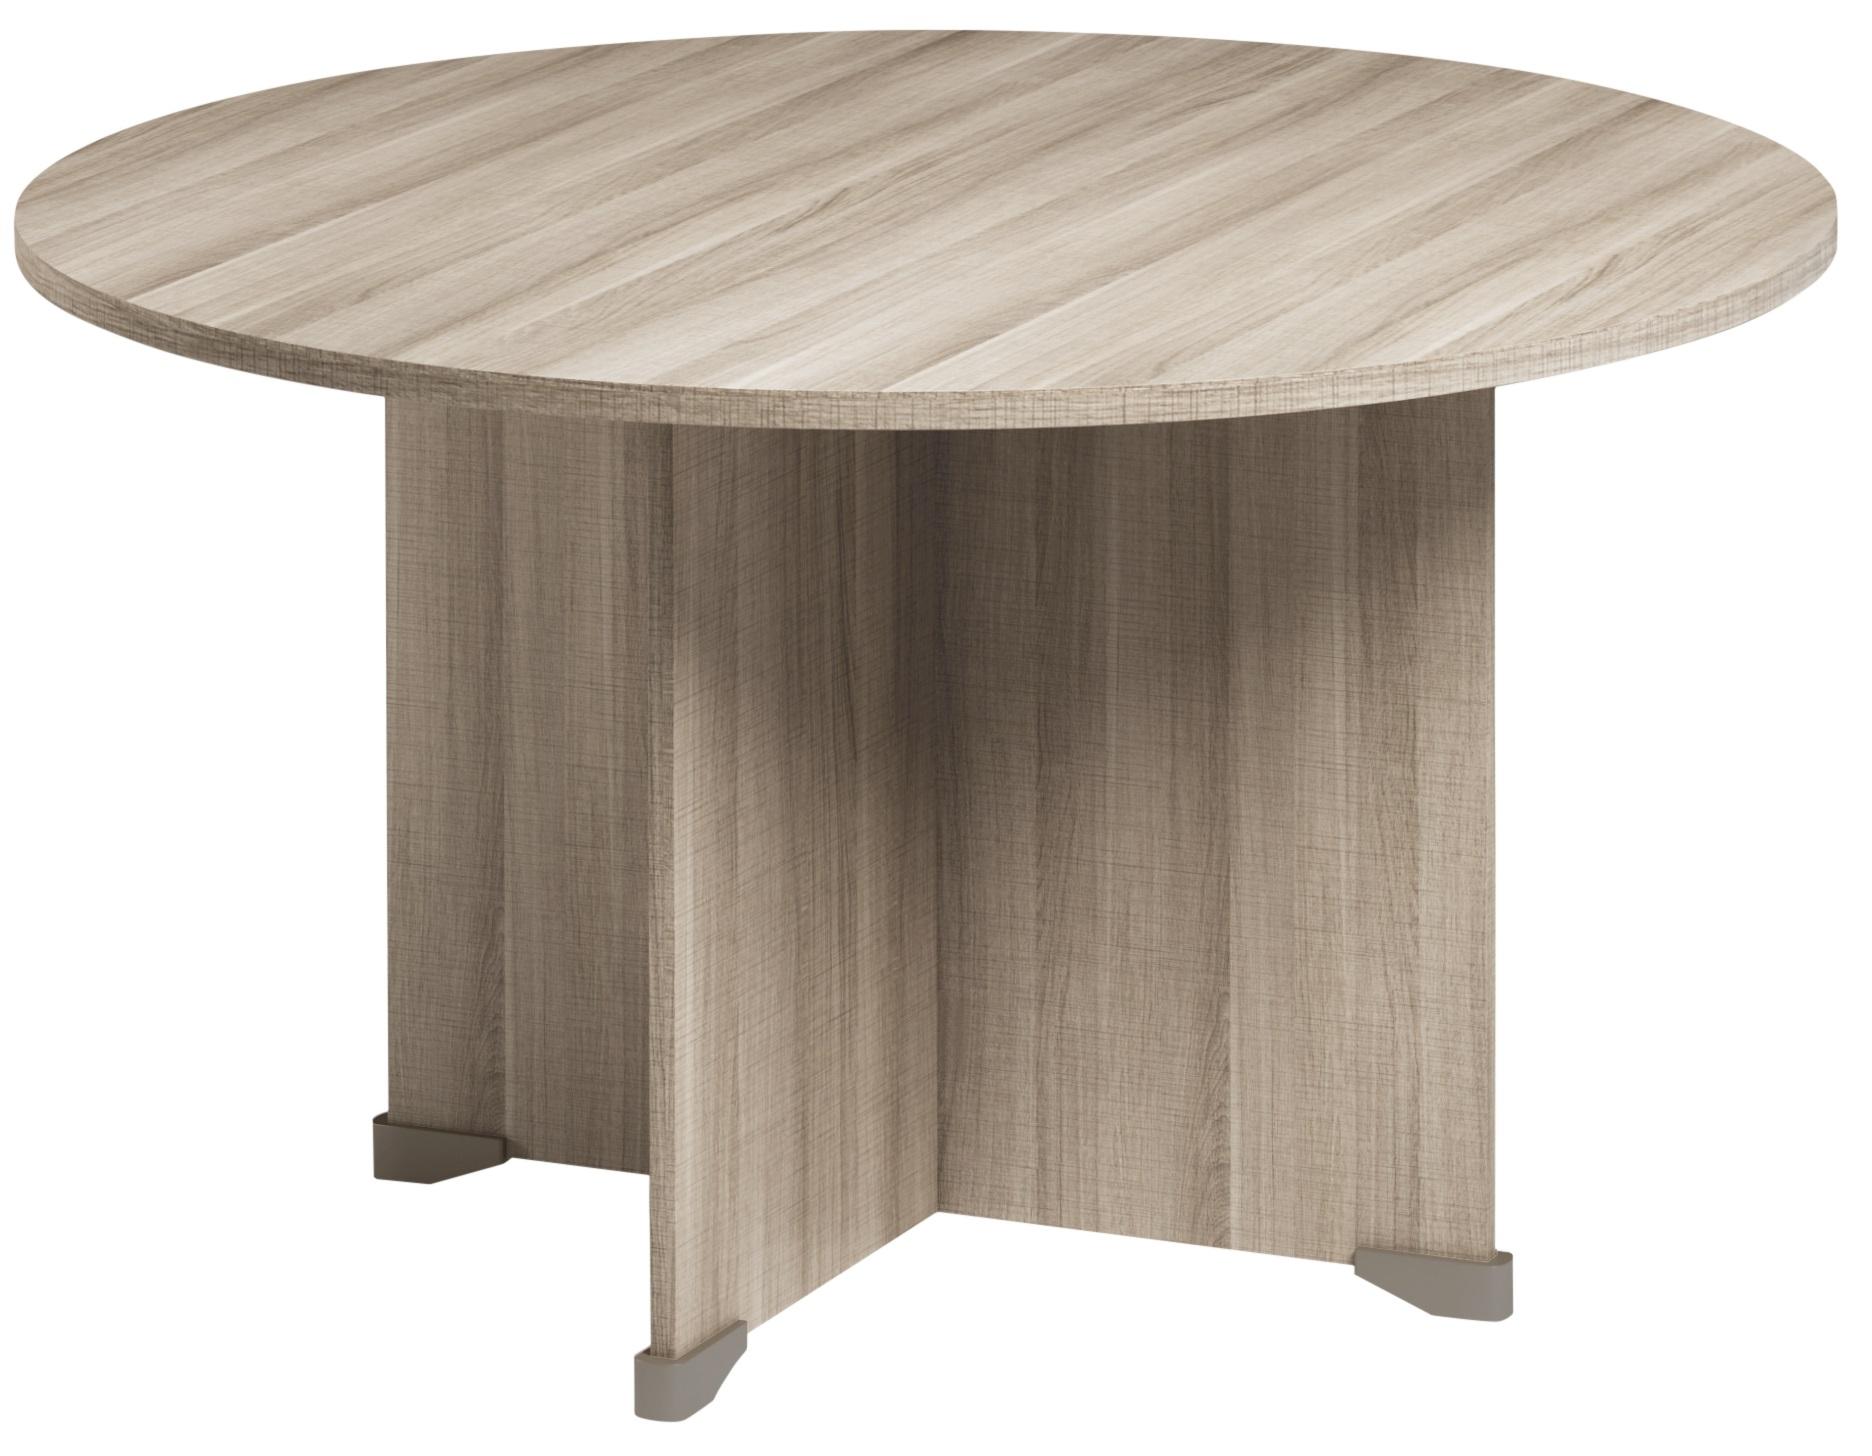 JAZZ+ CHÊNE GRIS TABLE RONDE